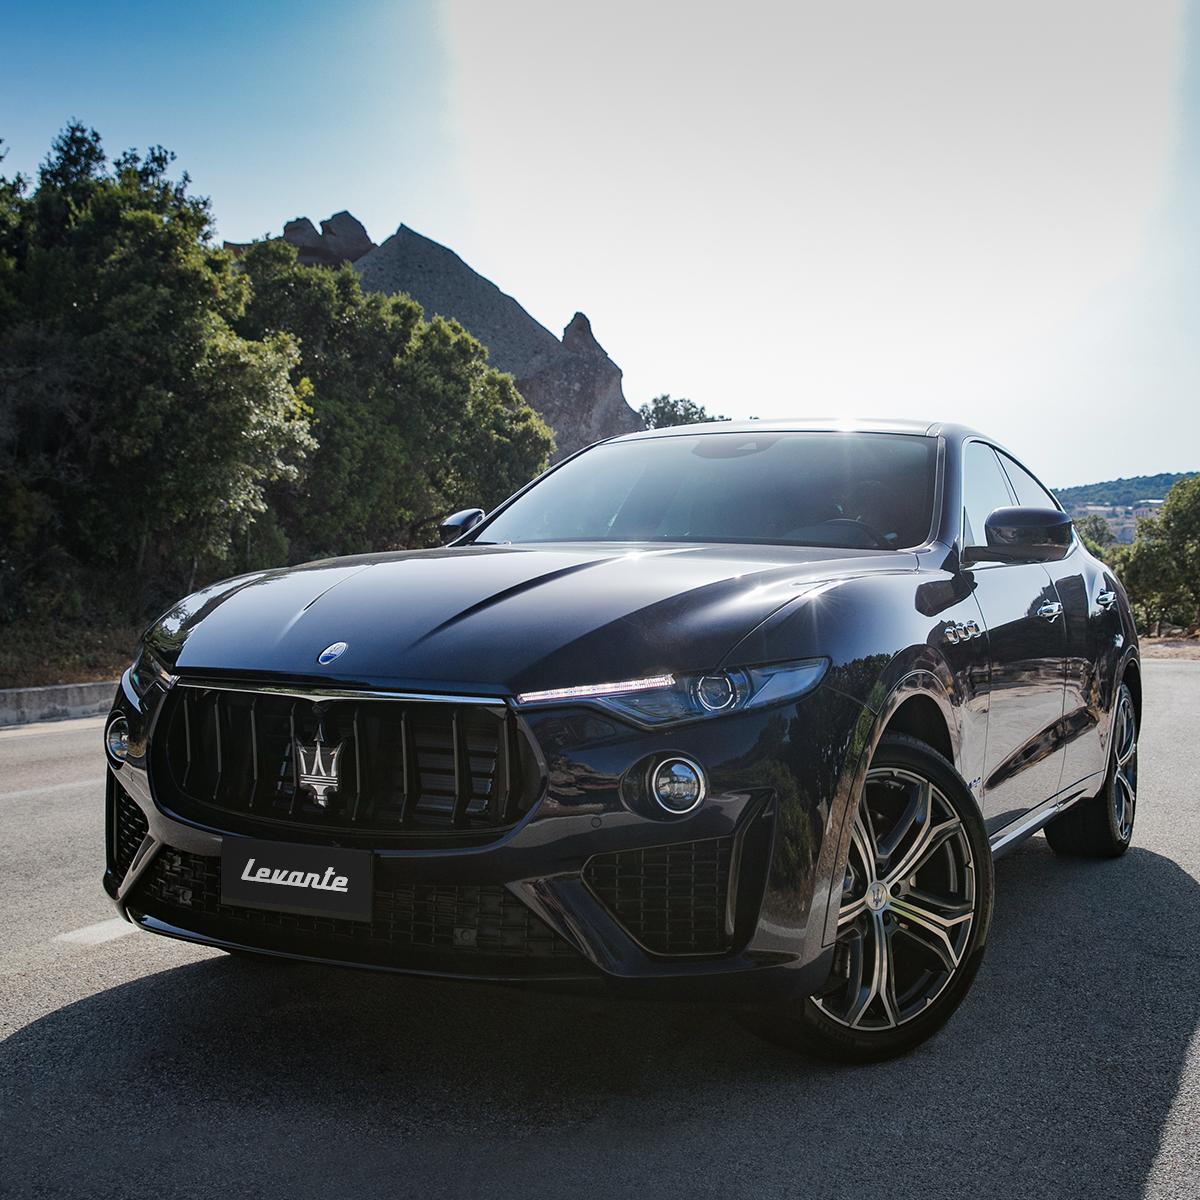 Beauty Is Around Every Corner Maserati Luxury Cars Rolls Royce Jeep Cars